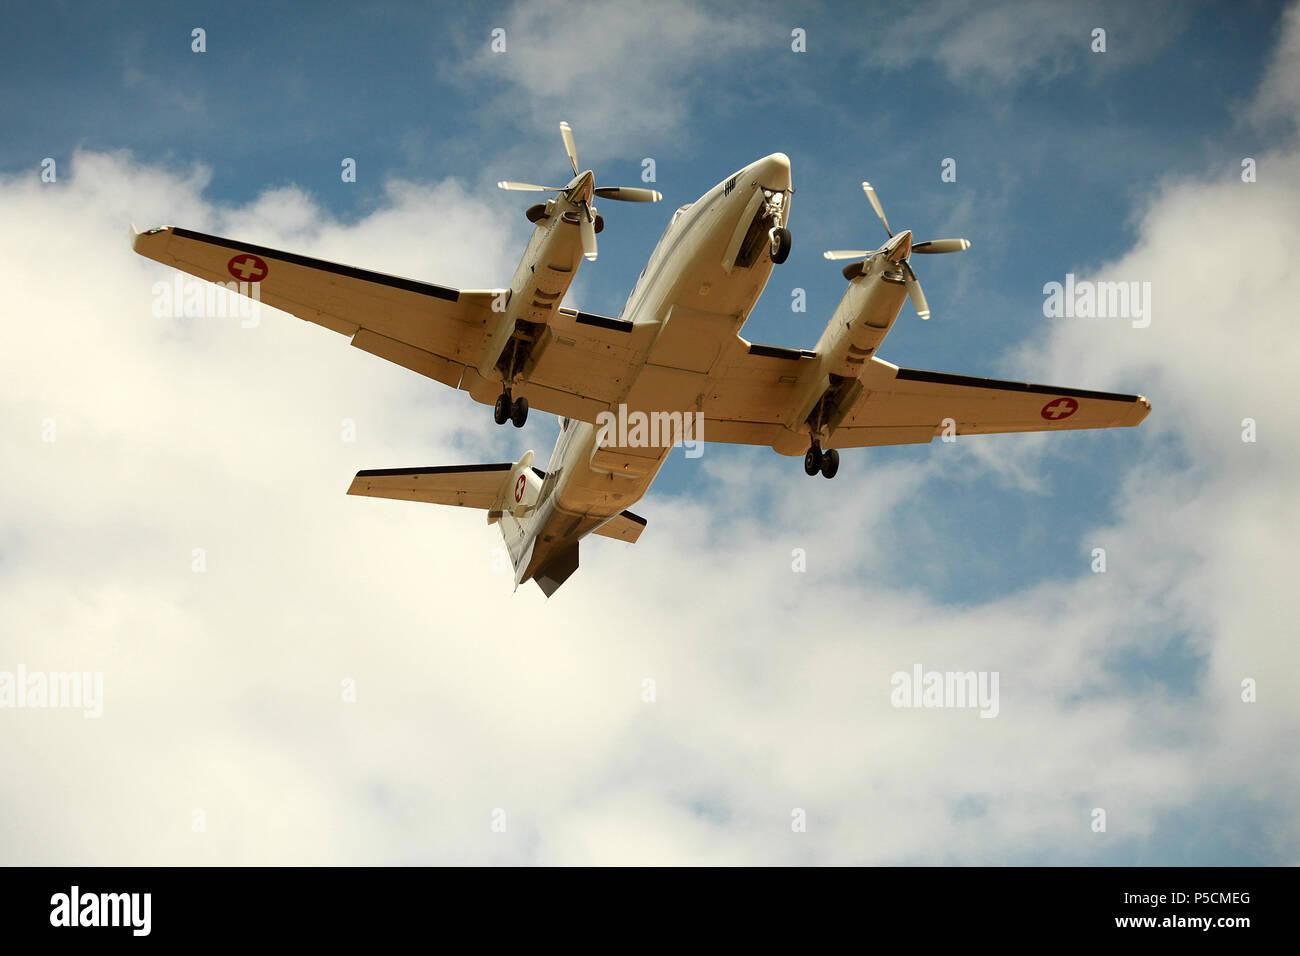 aircraft landing at an airport - Stock Image